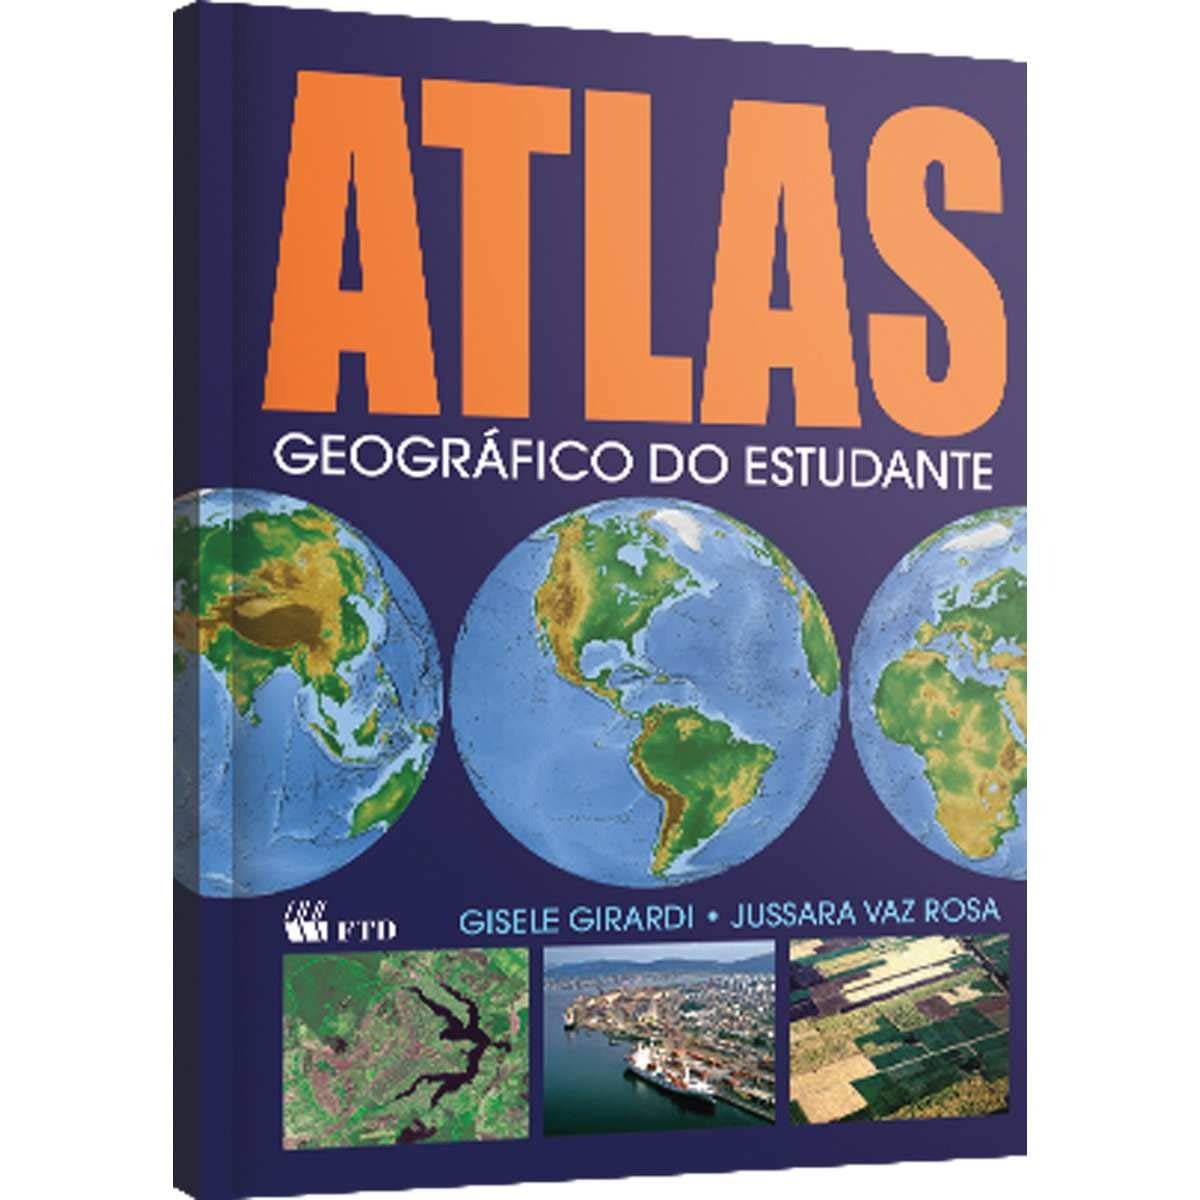 Atlas Geográfico do Estudante Em Portuguese do Brasil: Amazon.es: Gisele Girardi: Libros